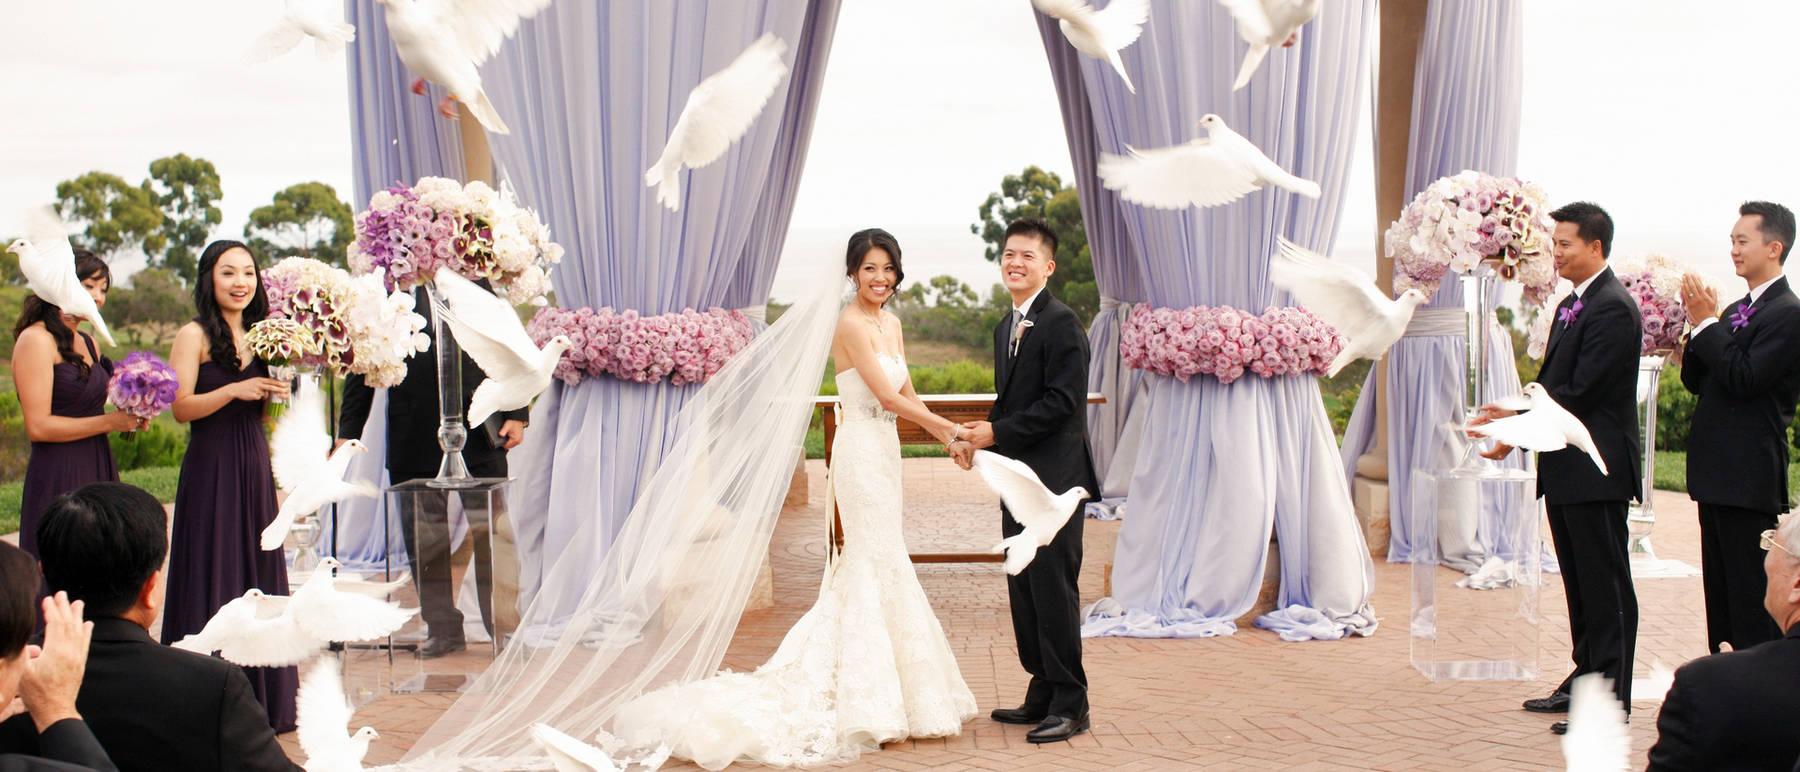 johnandjoseph-wedding-photographer-hz-slider-202